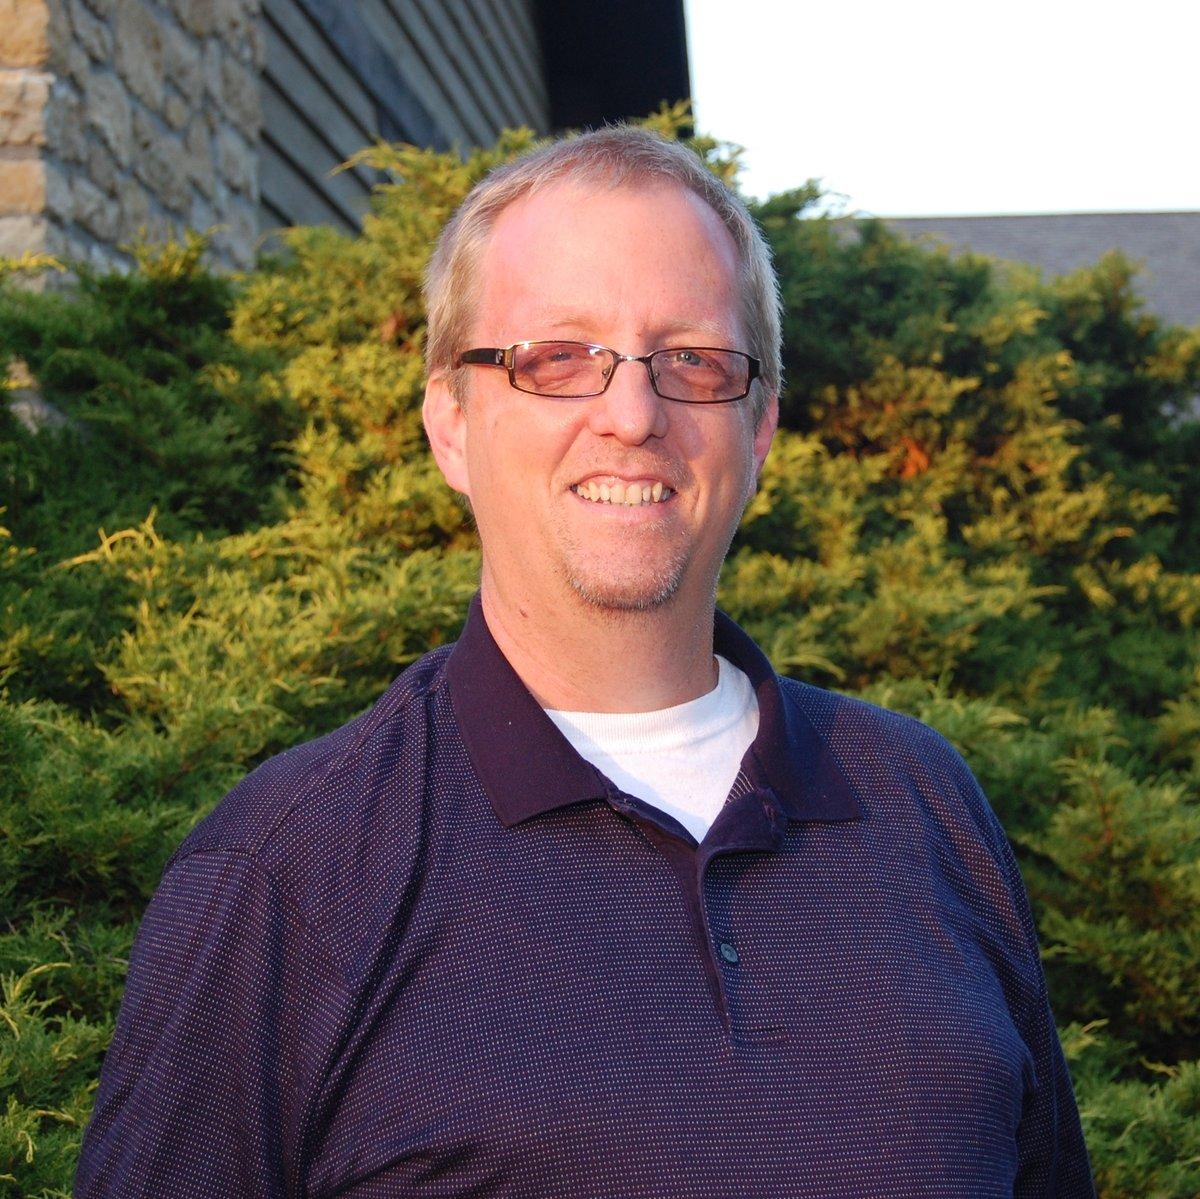 Mediator Steve Stuhlreyer | MediatorSelect.com